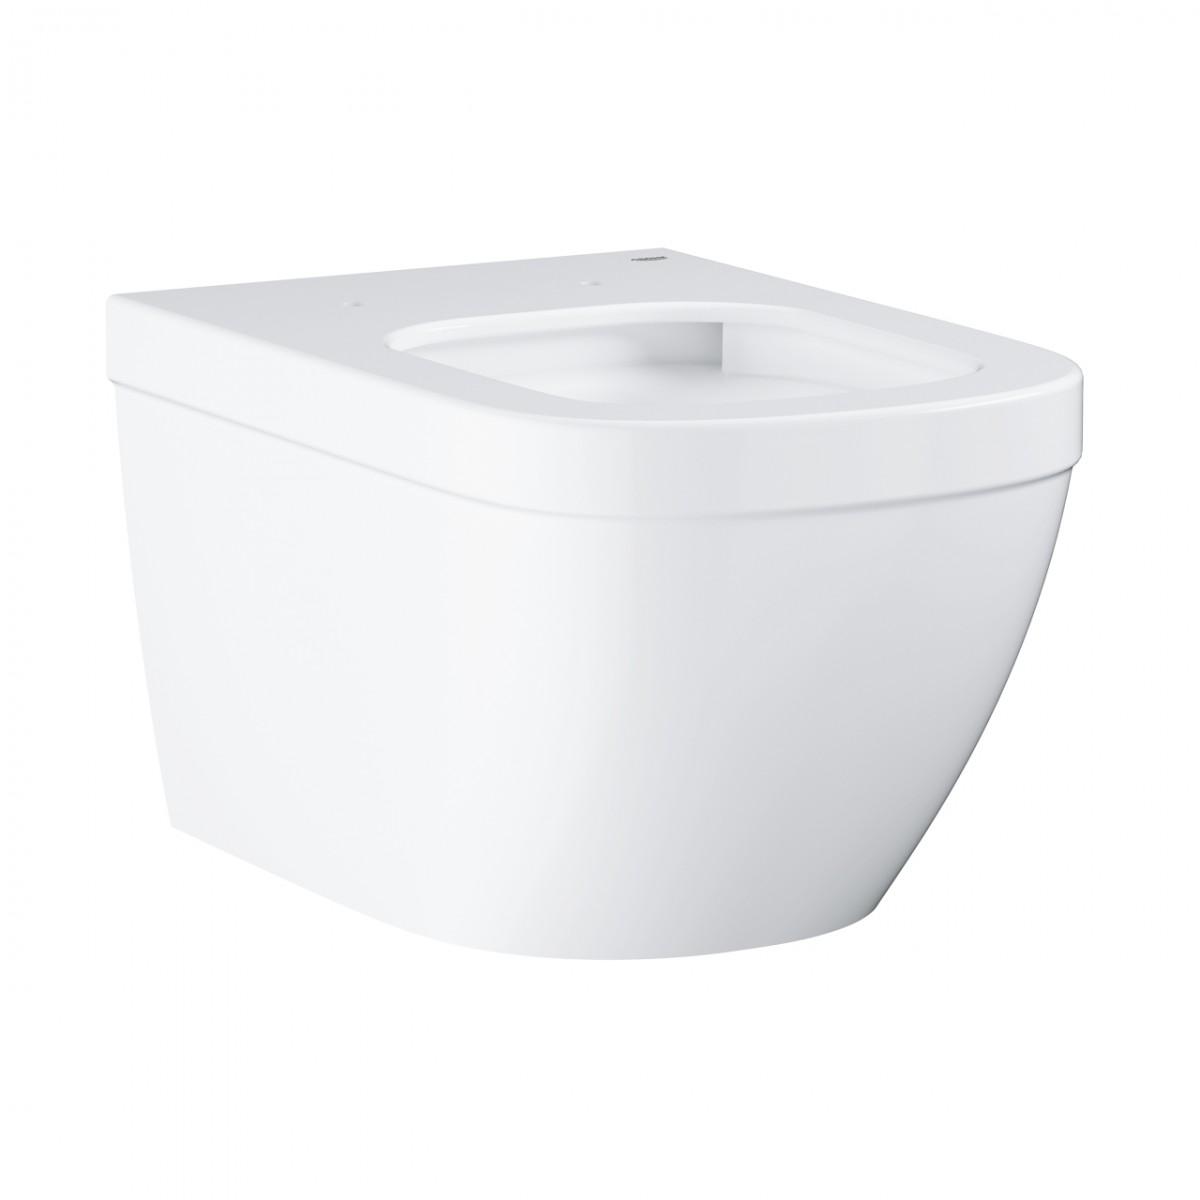 Унитаз подвесной Grohe Pureguard Euro Ceramic 3932800H